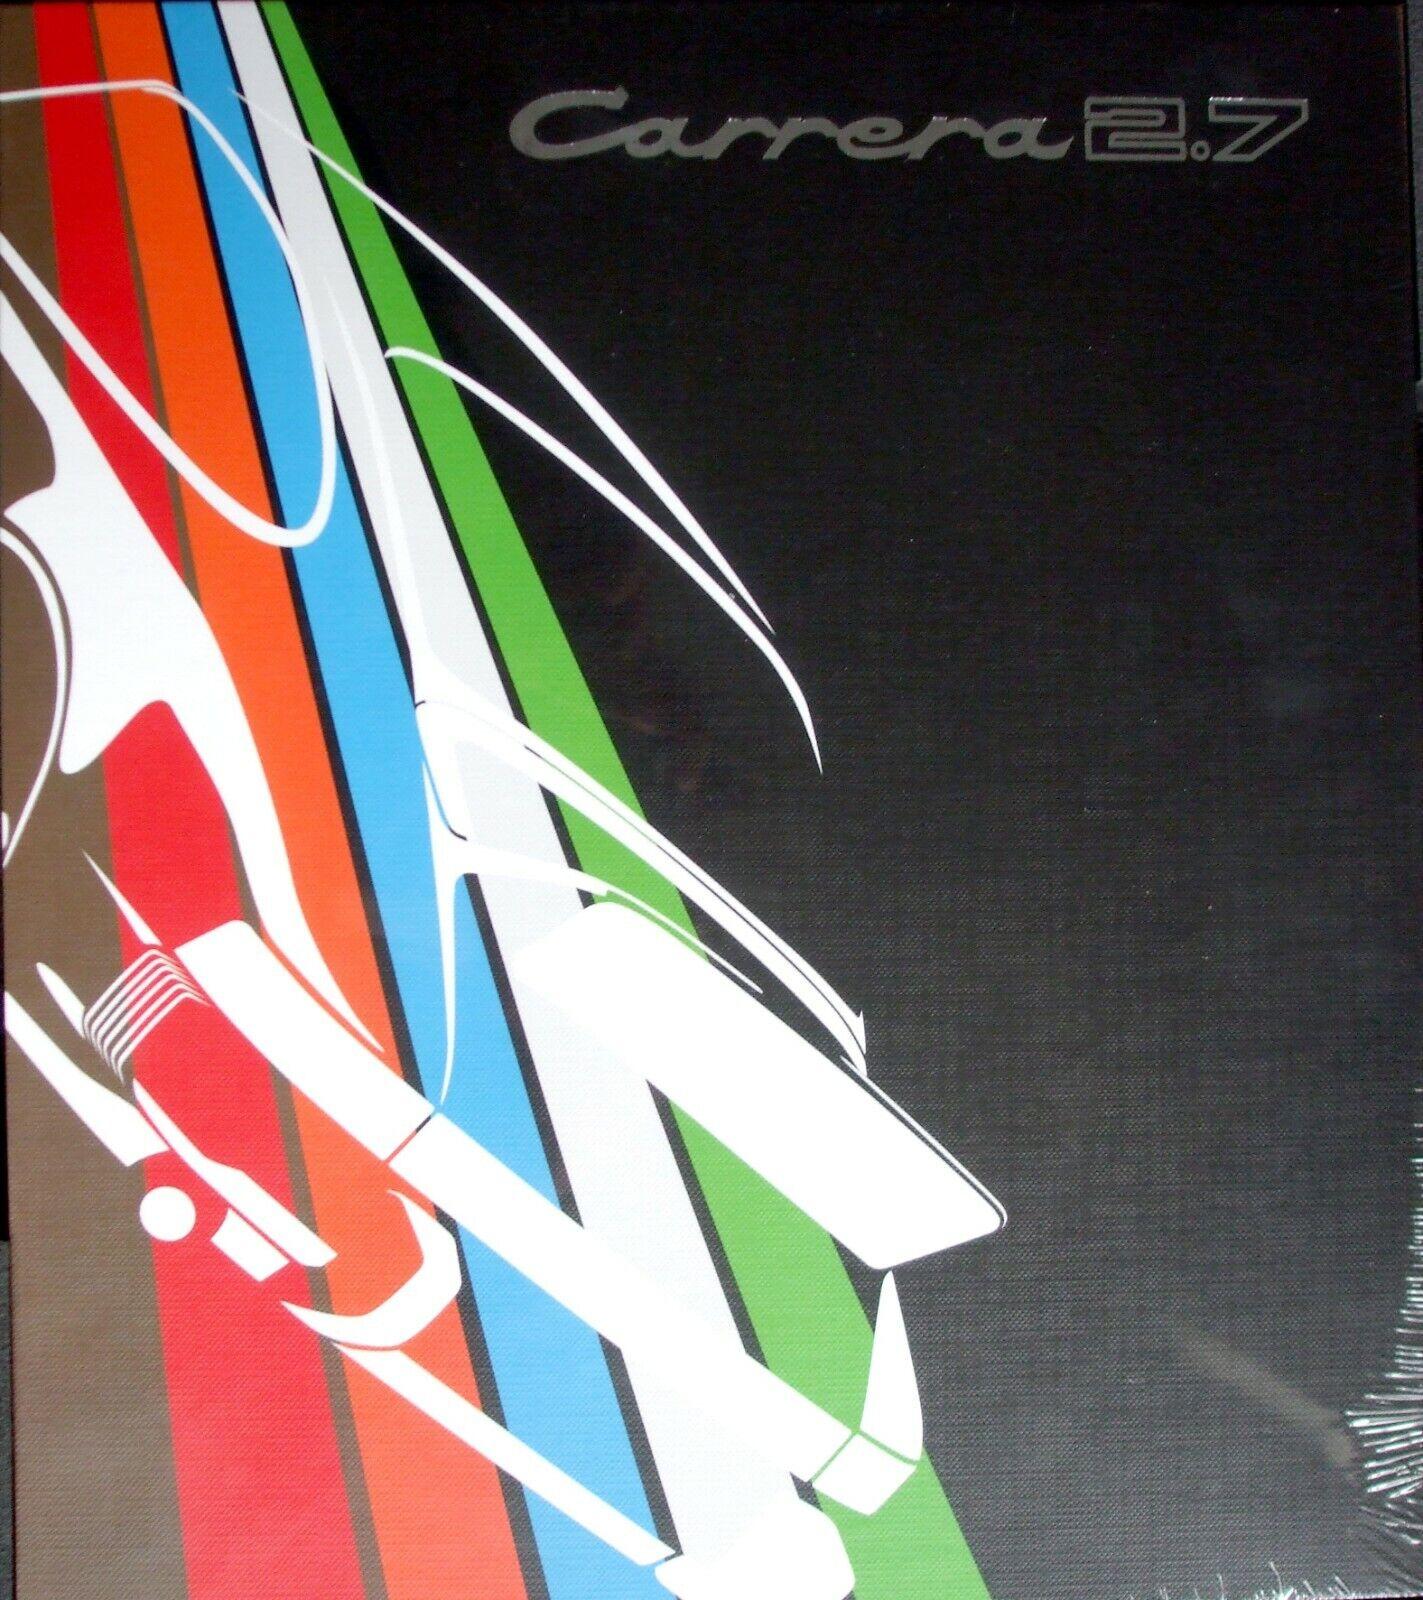 Ryan Snodgrass ~ Porsche CARRERA 2.7 RS Lives on MFI 911 ~ NEW Limited 20/2500